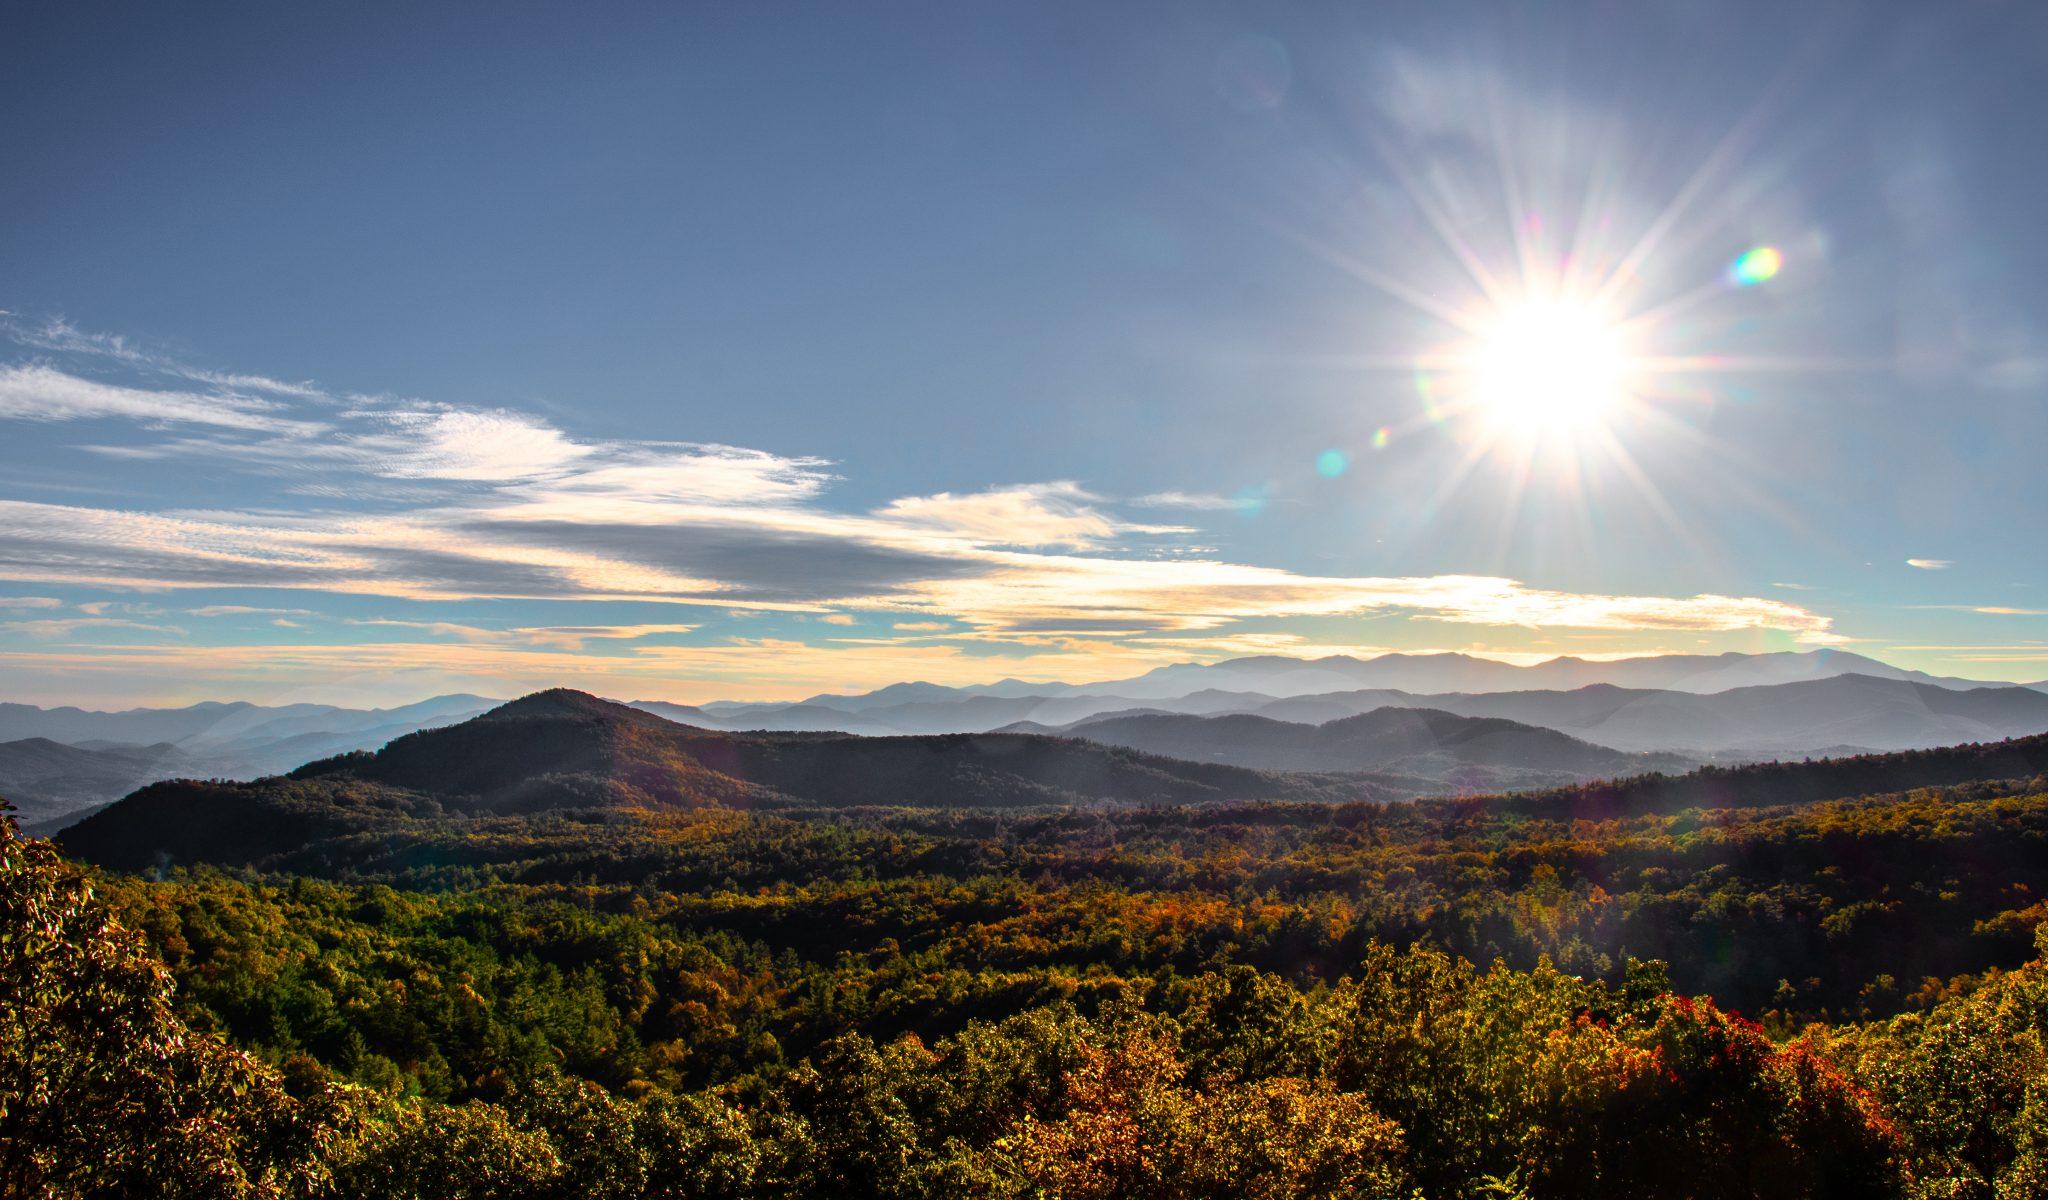 Blowing Rock - A beautiful mountain village in North Carolina, USA!